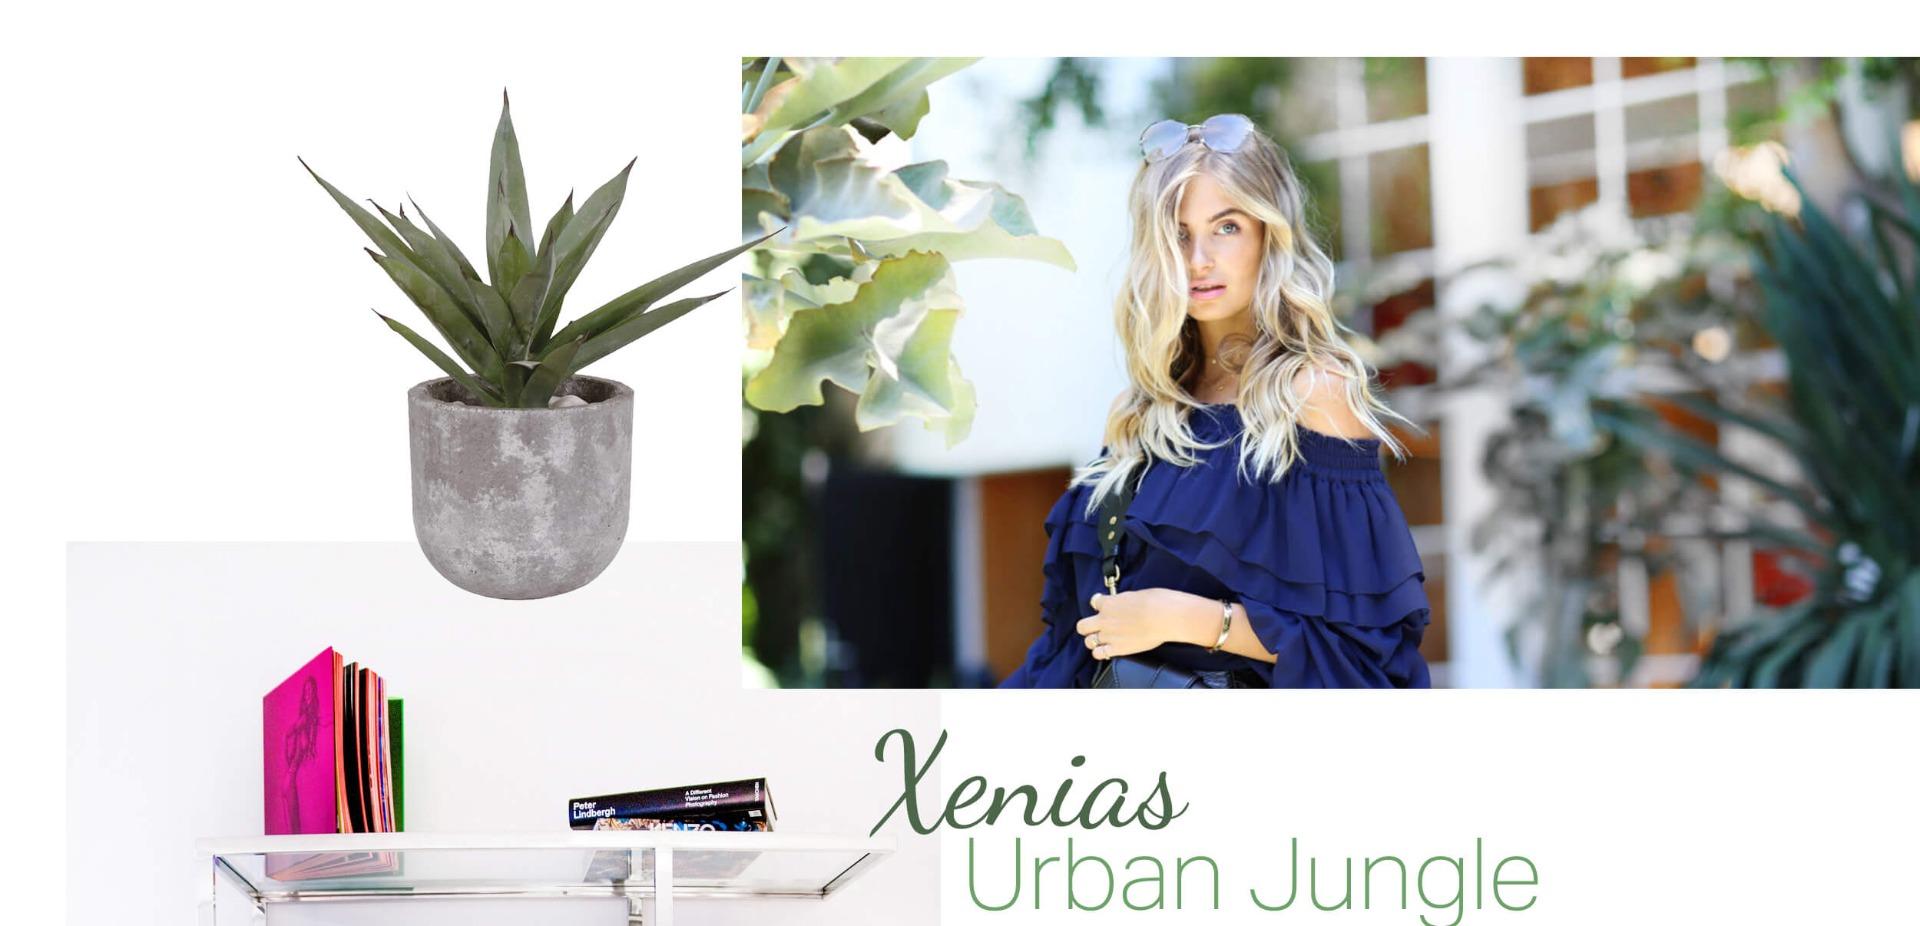 Xenias Urban Jungle - Looks